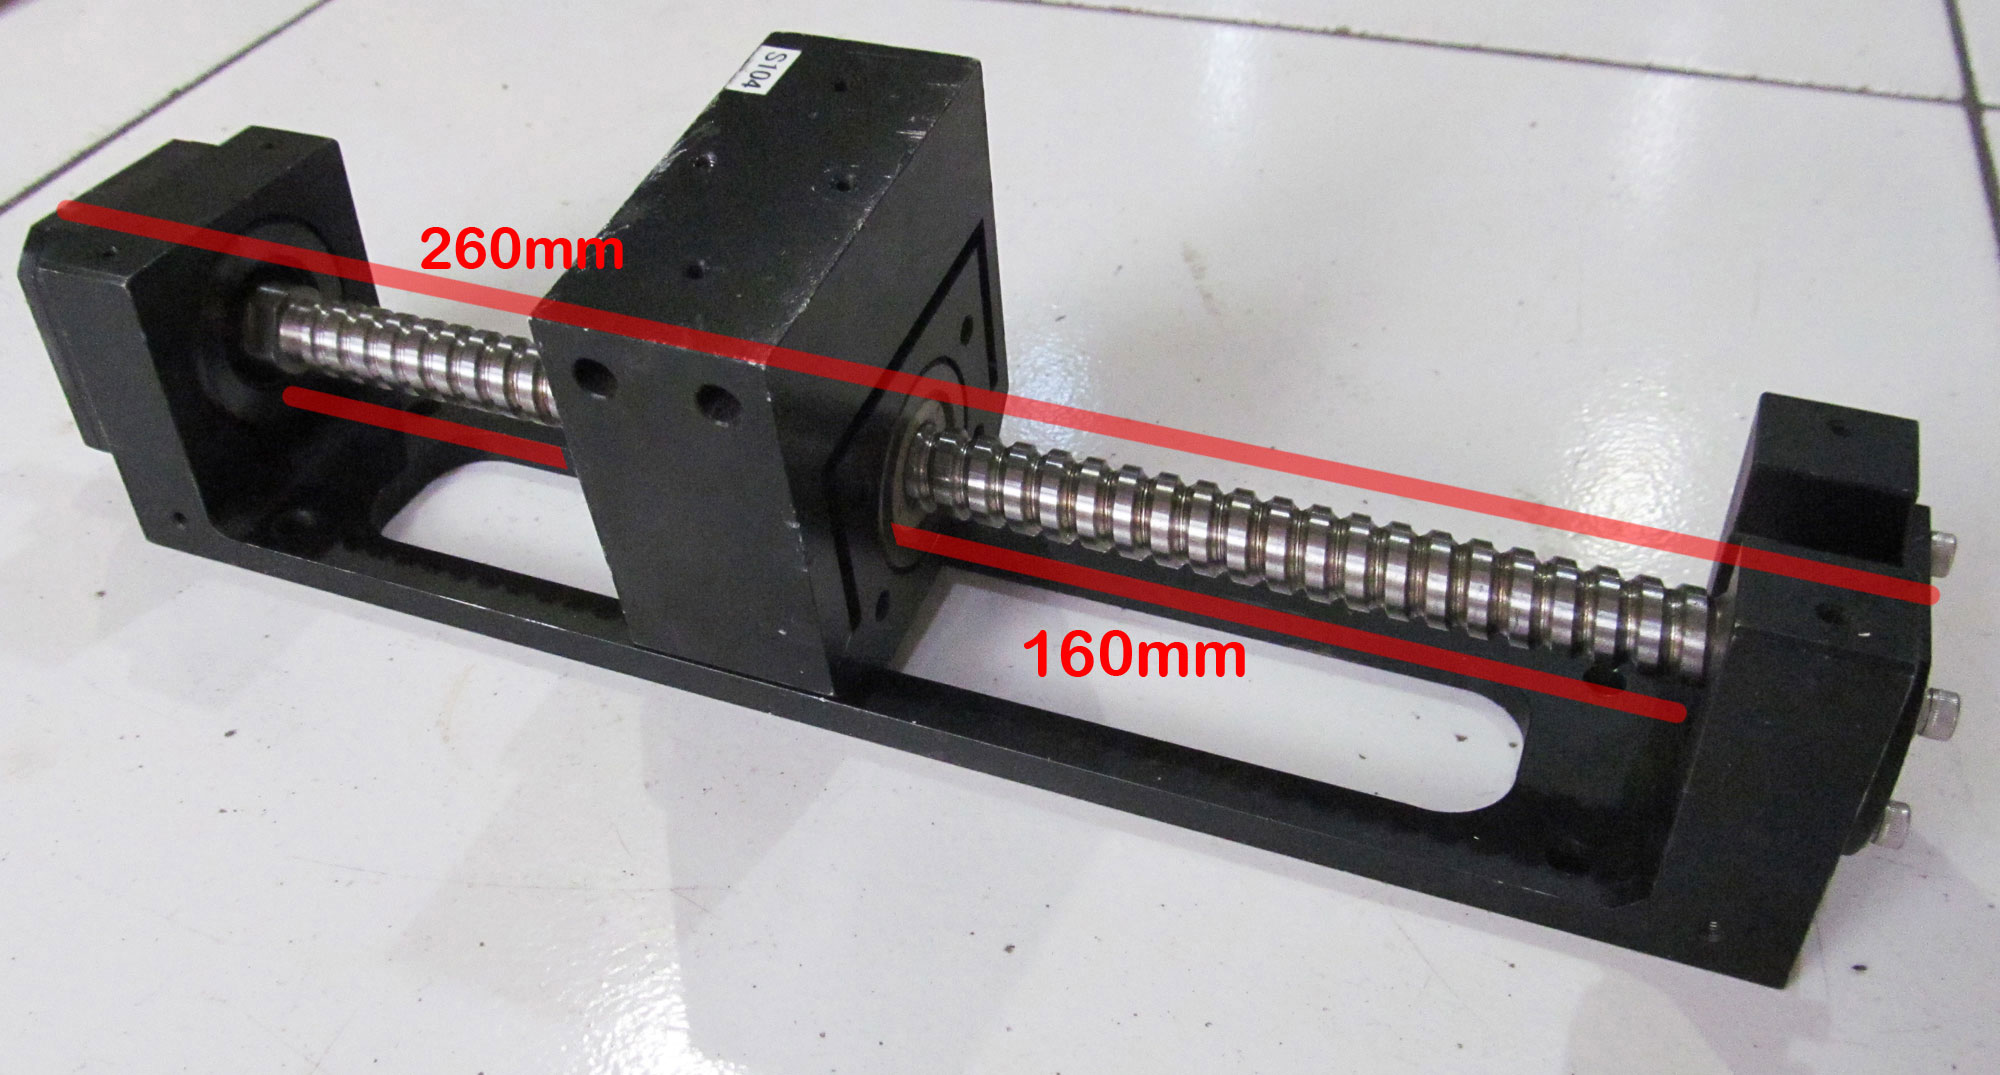 harga Ballscrew+support, travel length 160mm, W1202FA-1P-C3Z, NSK Tokopedia.com